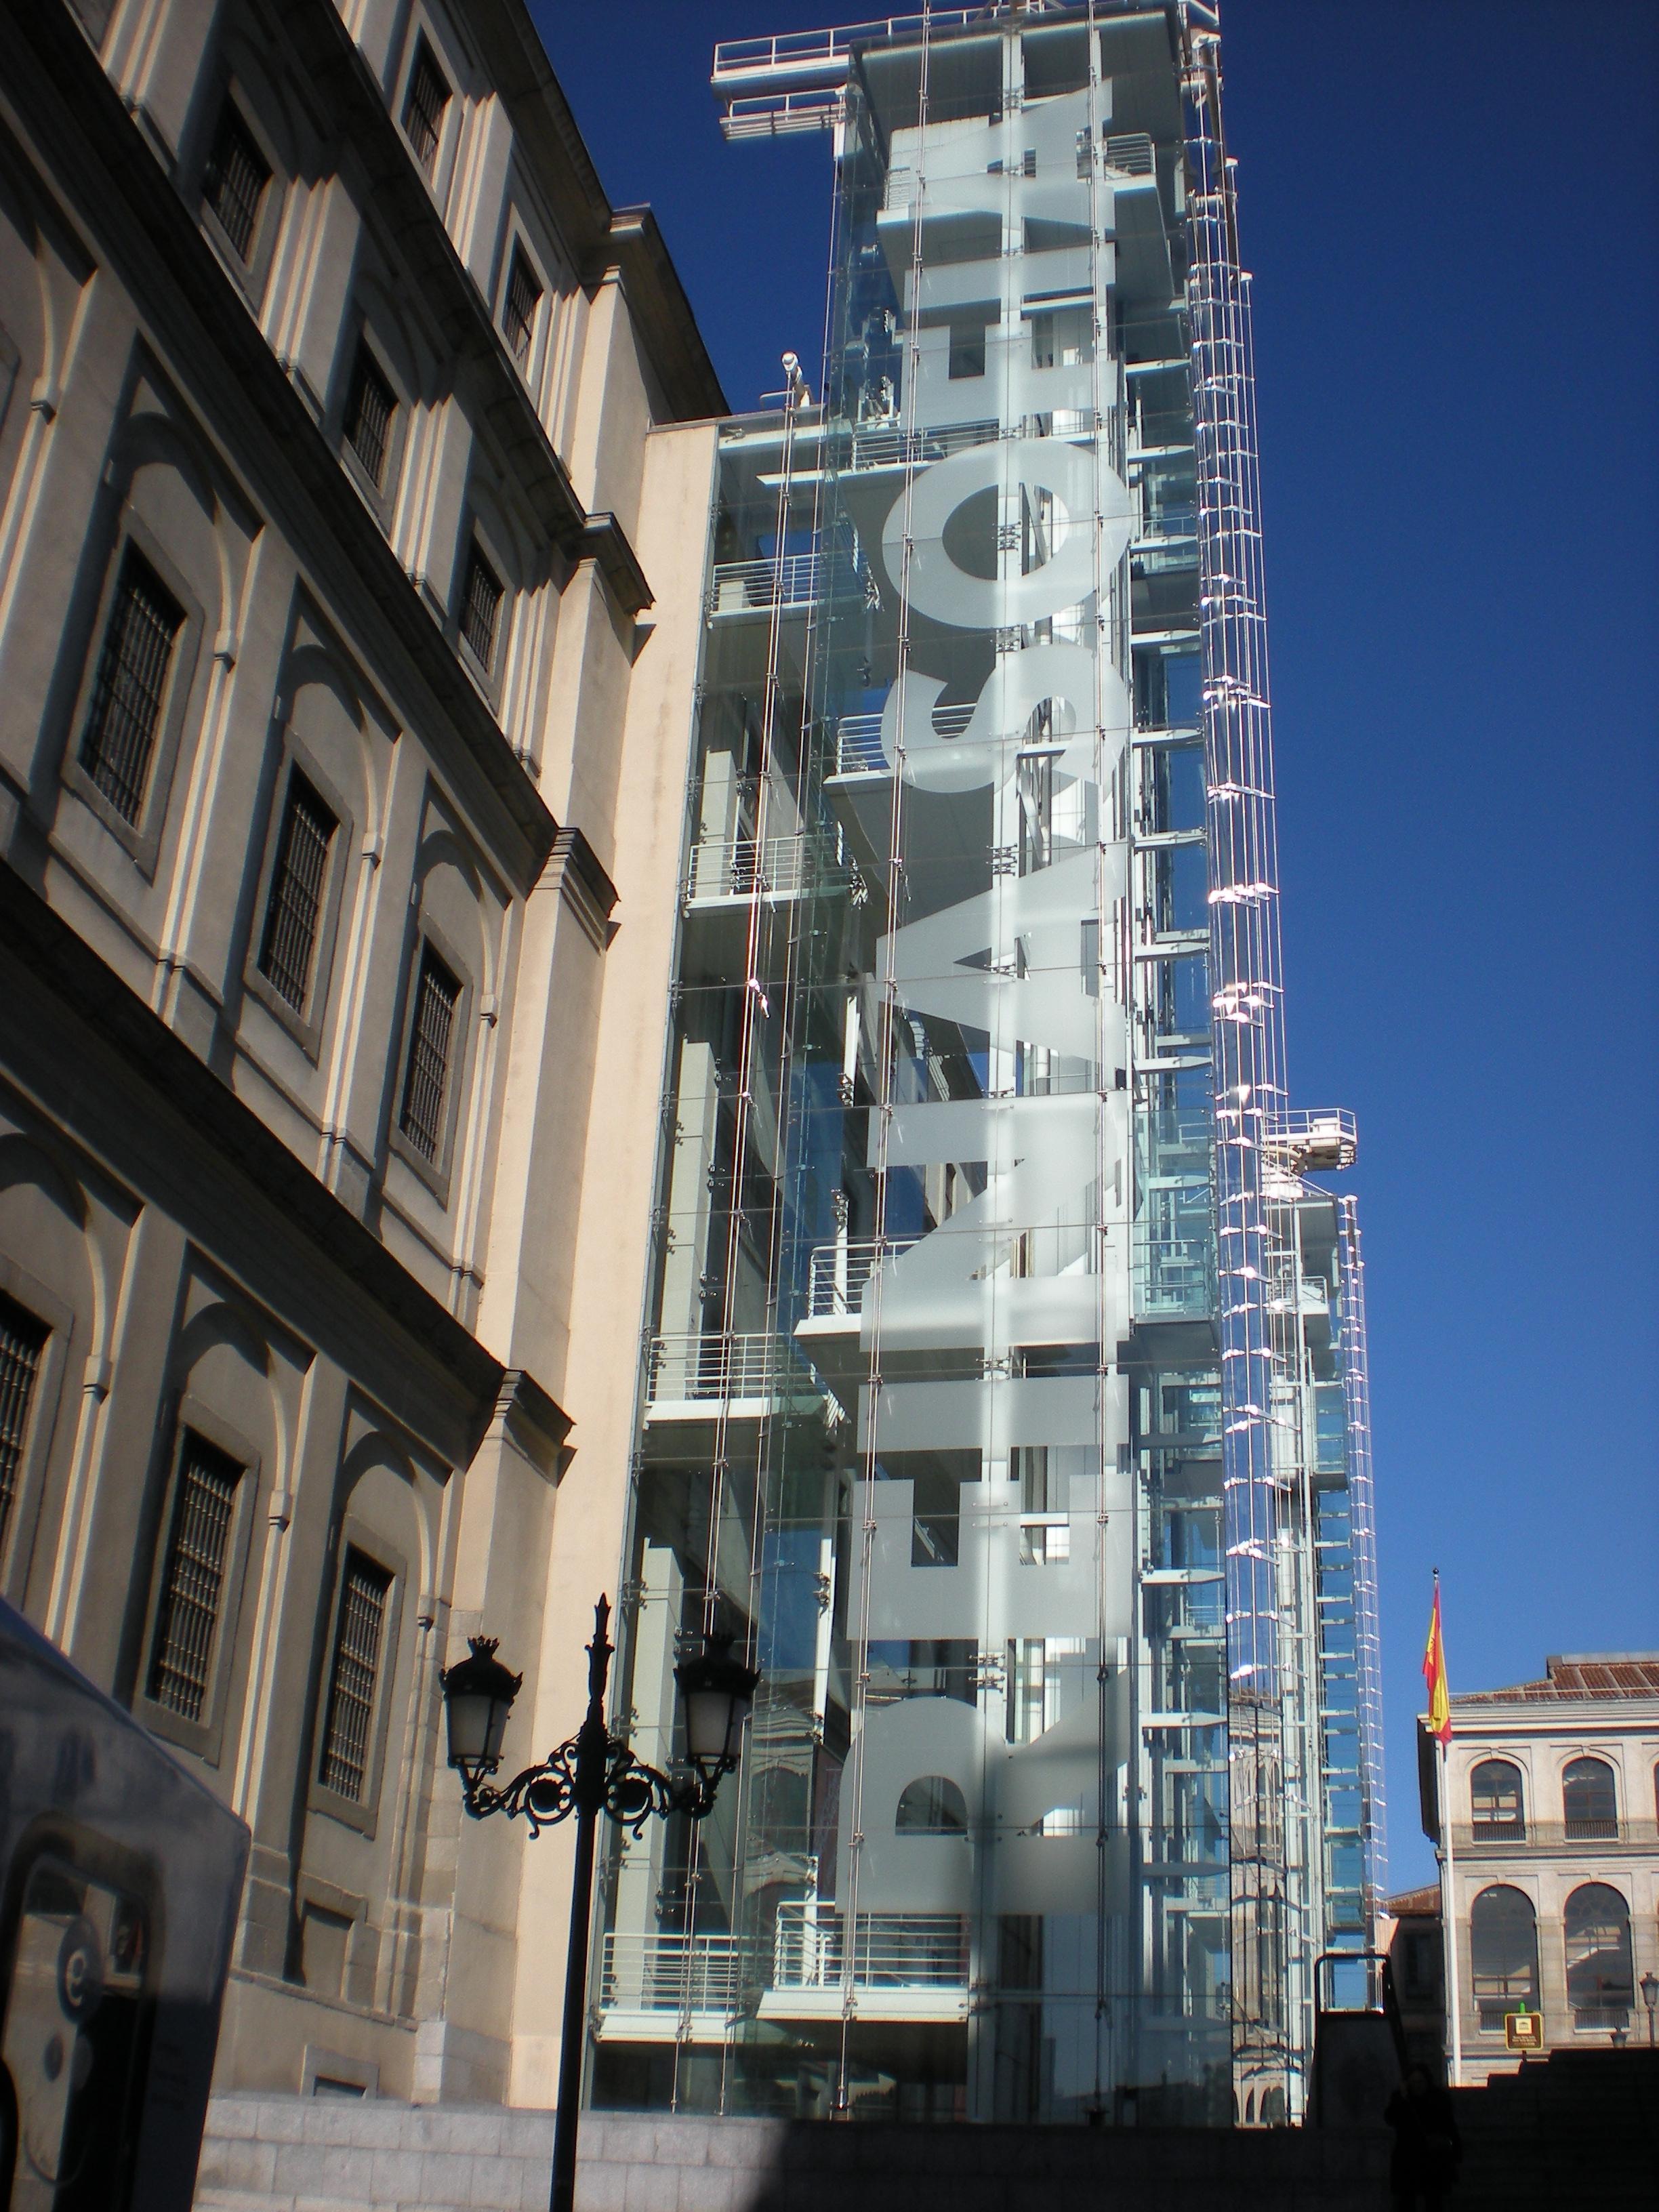 Museo Reina Sofia.File Museo Reina Sofia Elevators Jpg Wikimedia Commons